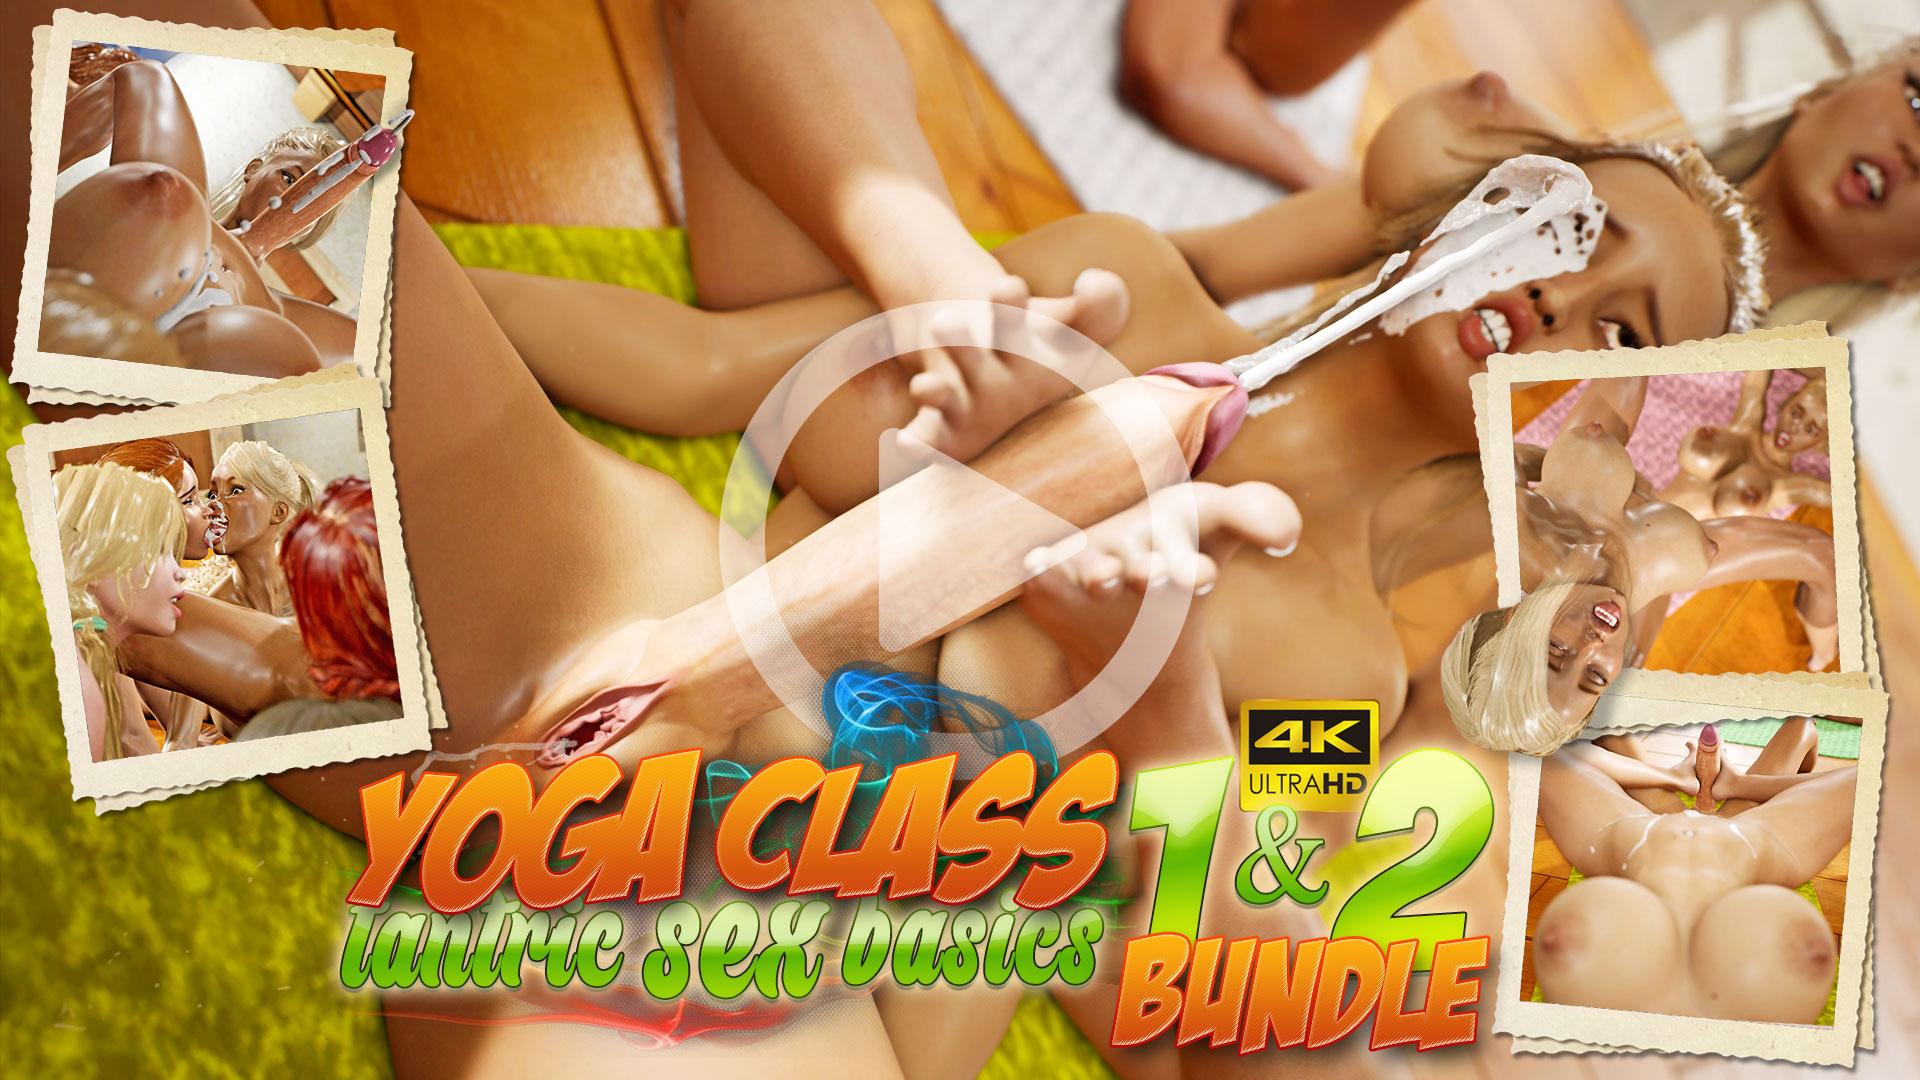 Yoga Class - Tantric Sex Basics Bundle 3DX video trailer